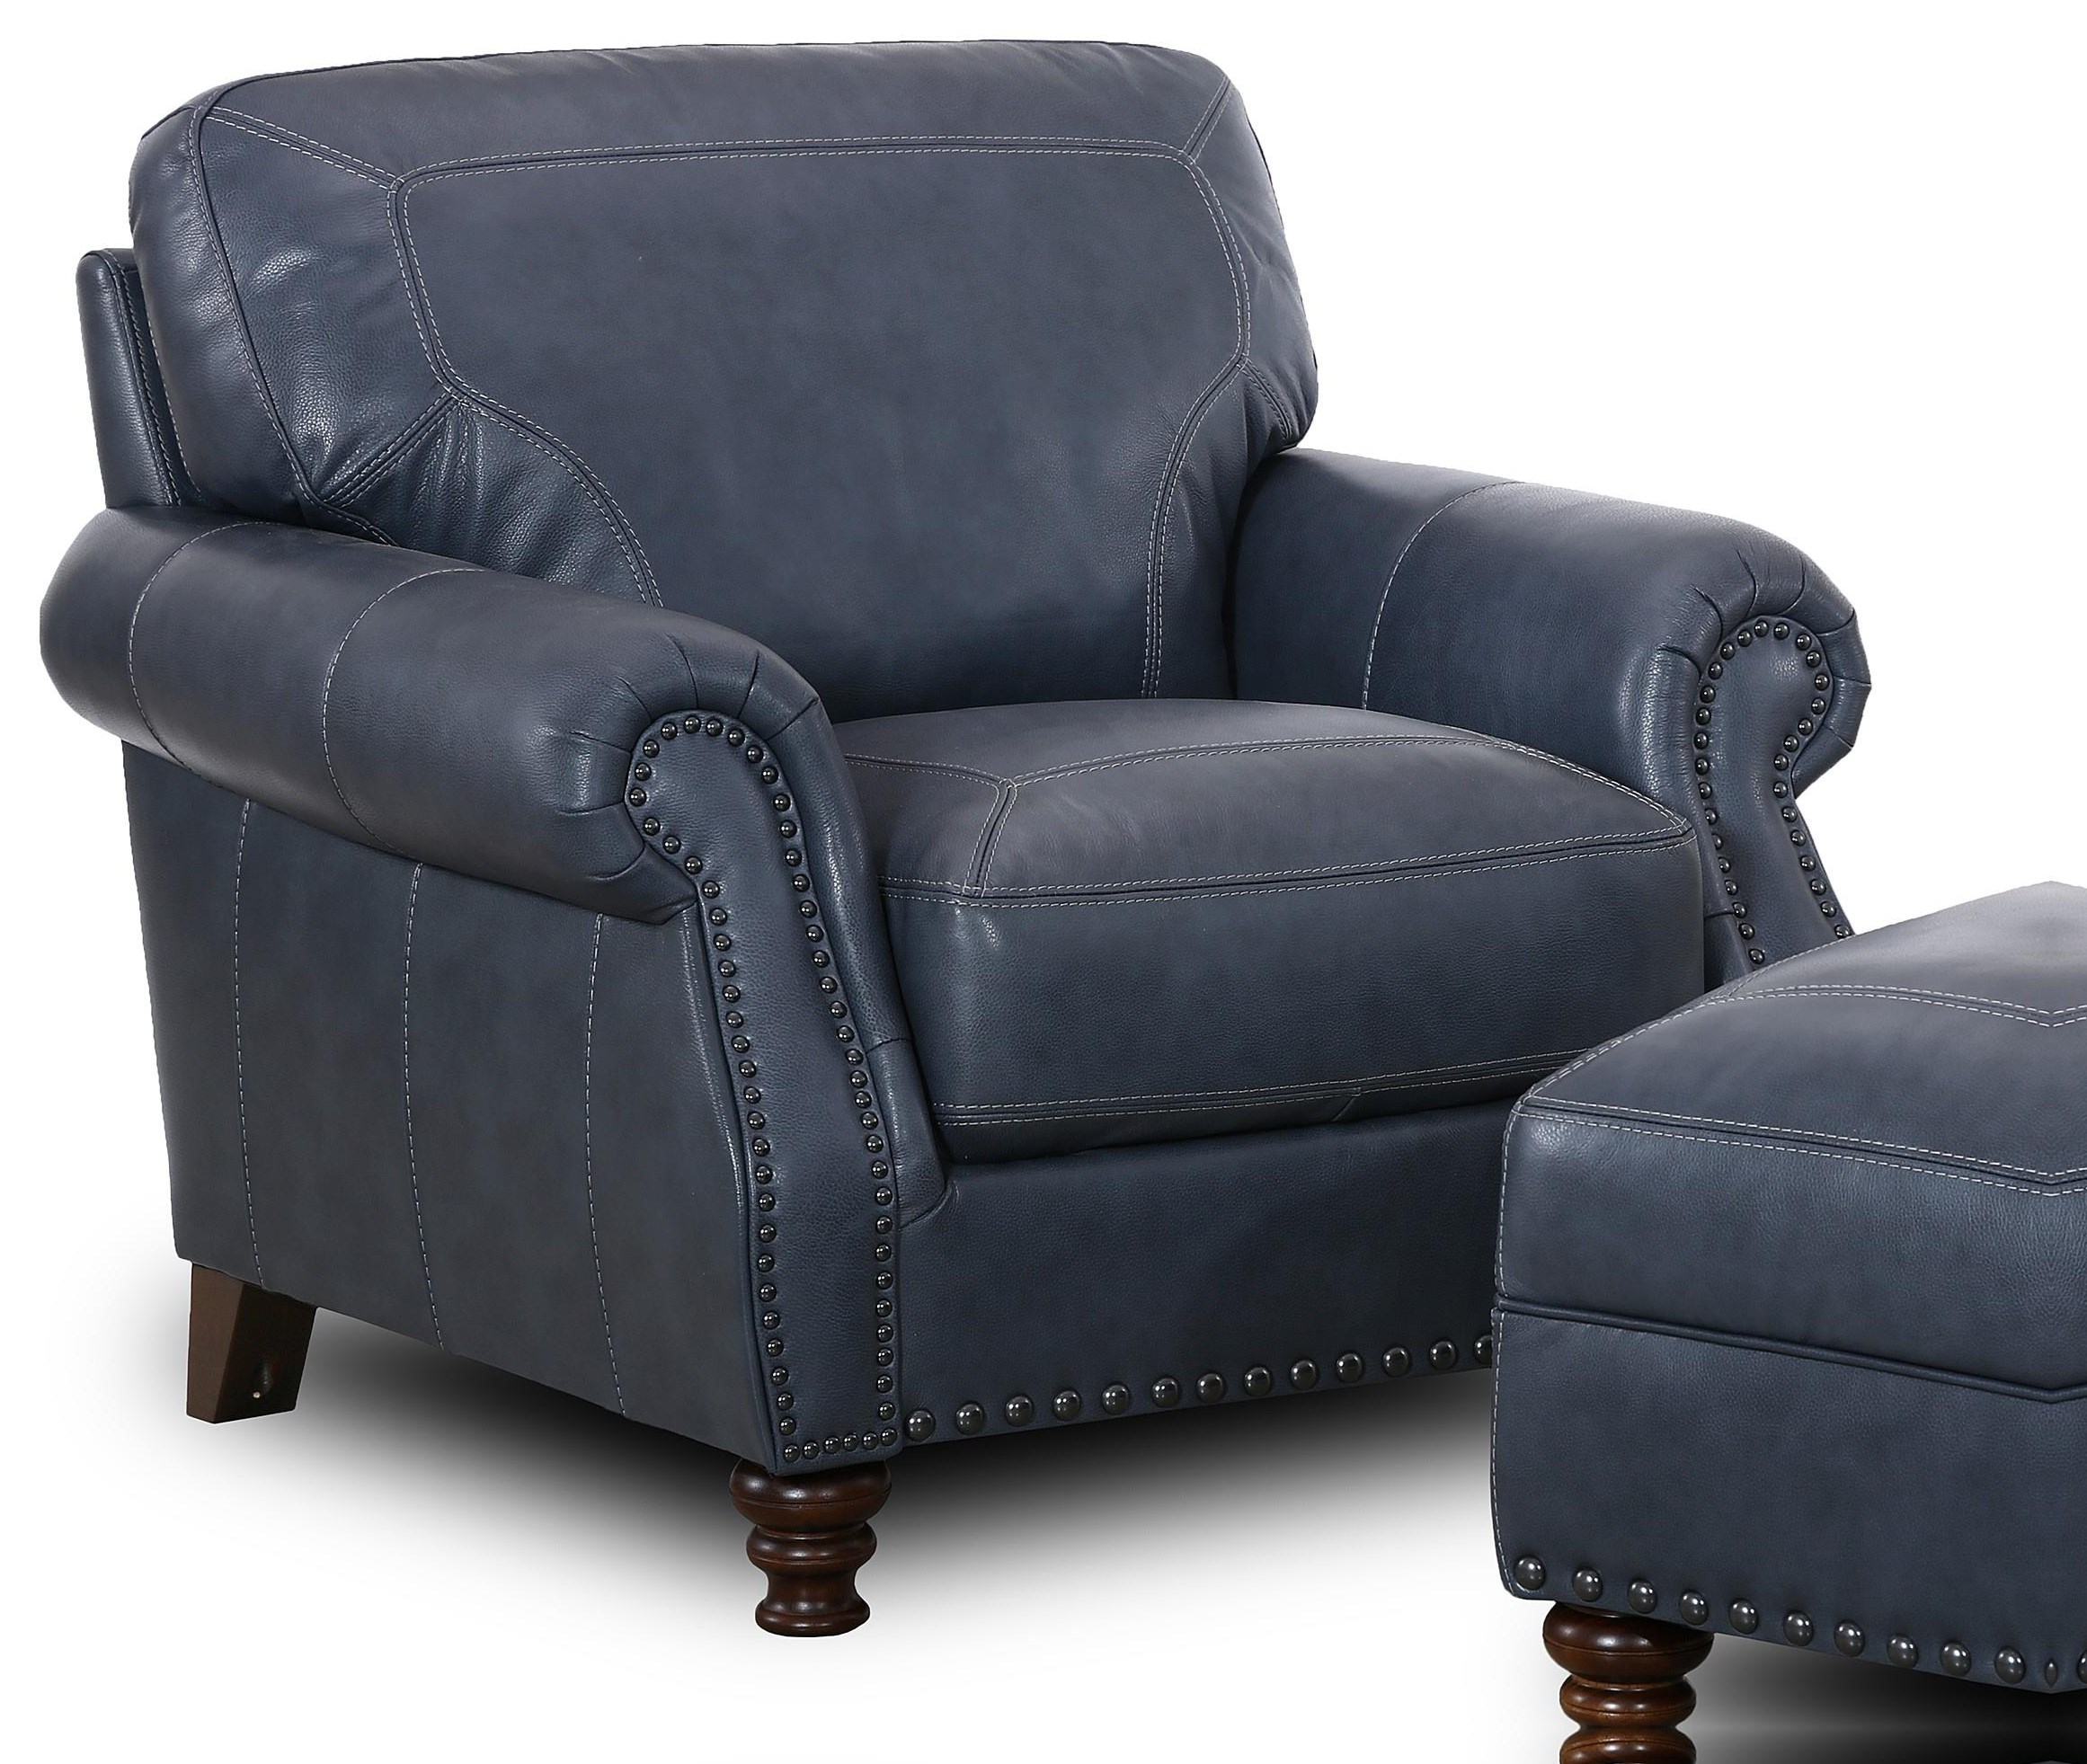 6978 Marine Marine Rolled Arm Chair by Simon Li at Furniture Fair - North Carolina